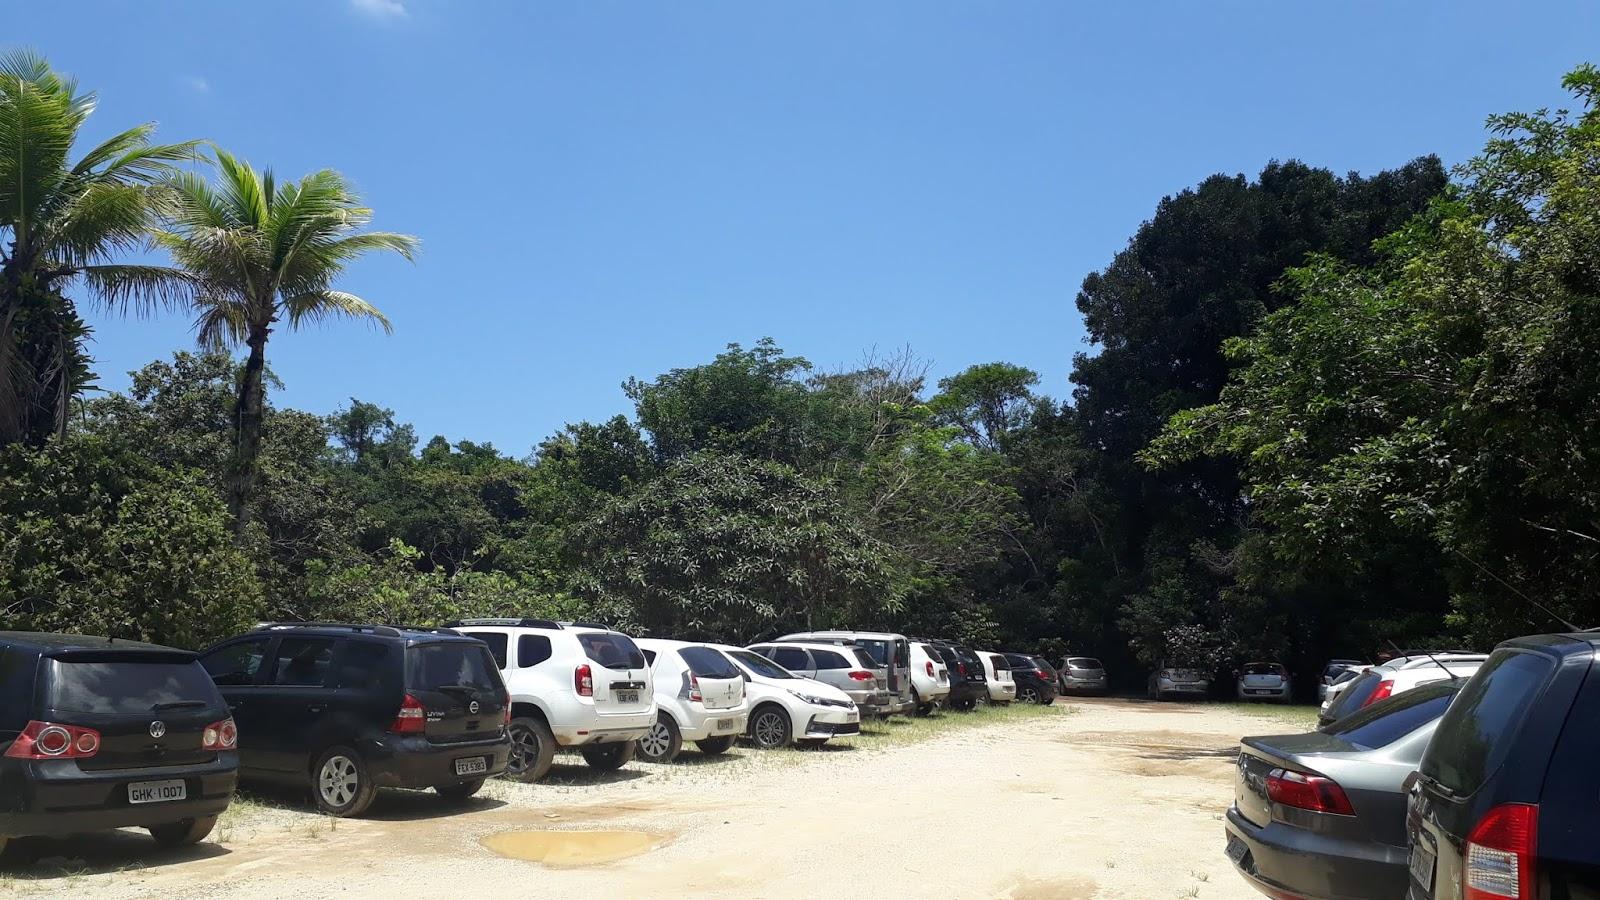 Estacionamento da Praia da Fazenda, Núcleo Picinguaba, Ubatuba